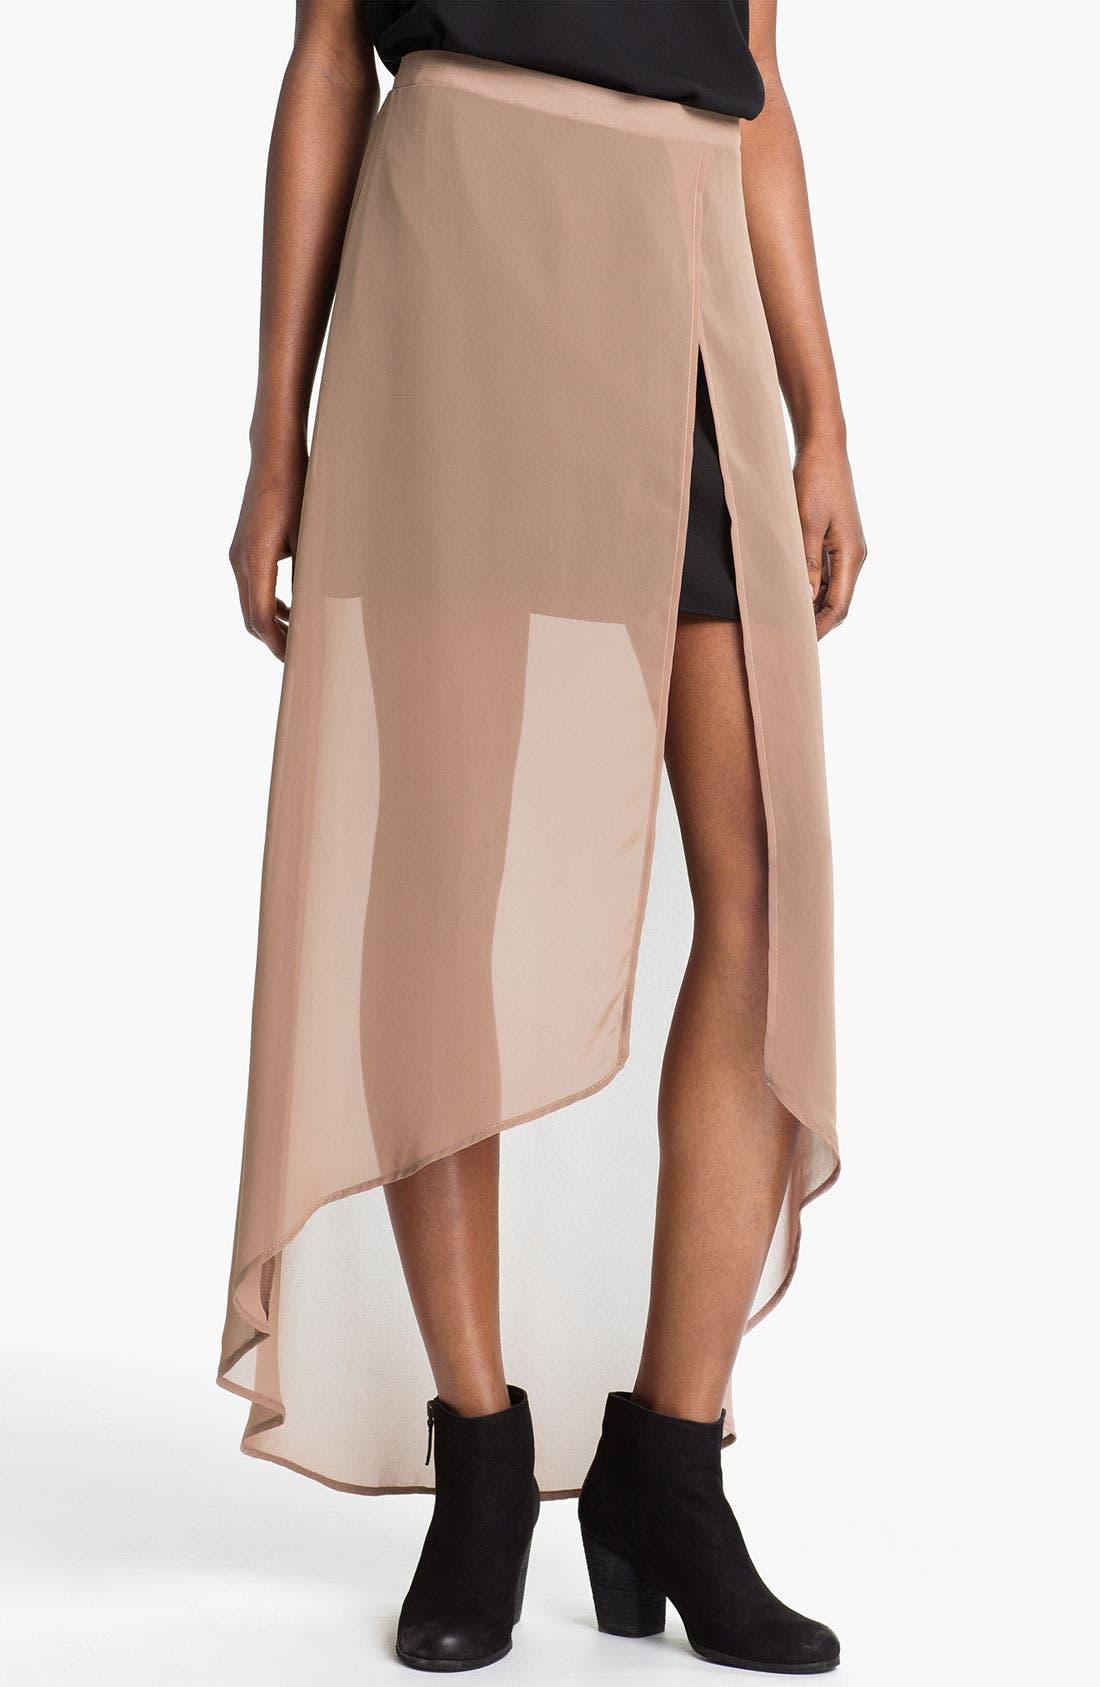 Alternate Image 1 Selected - Lush Layered High/Low Maxi Skirt (Juniors)